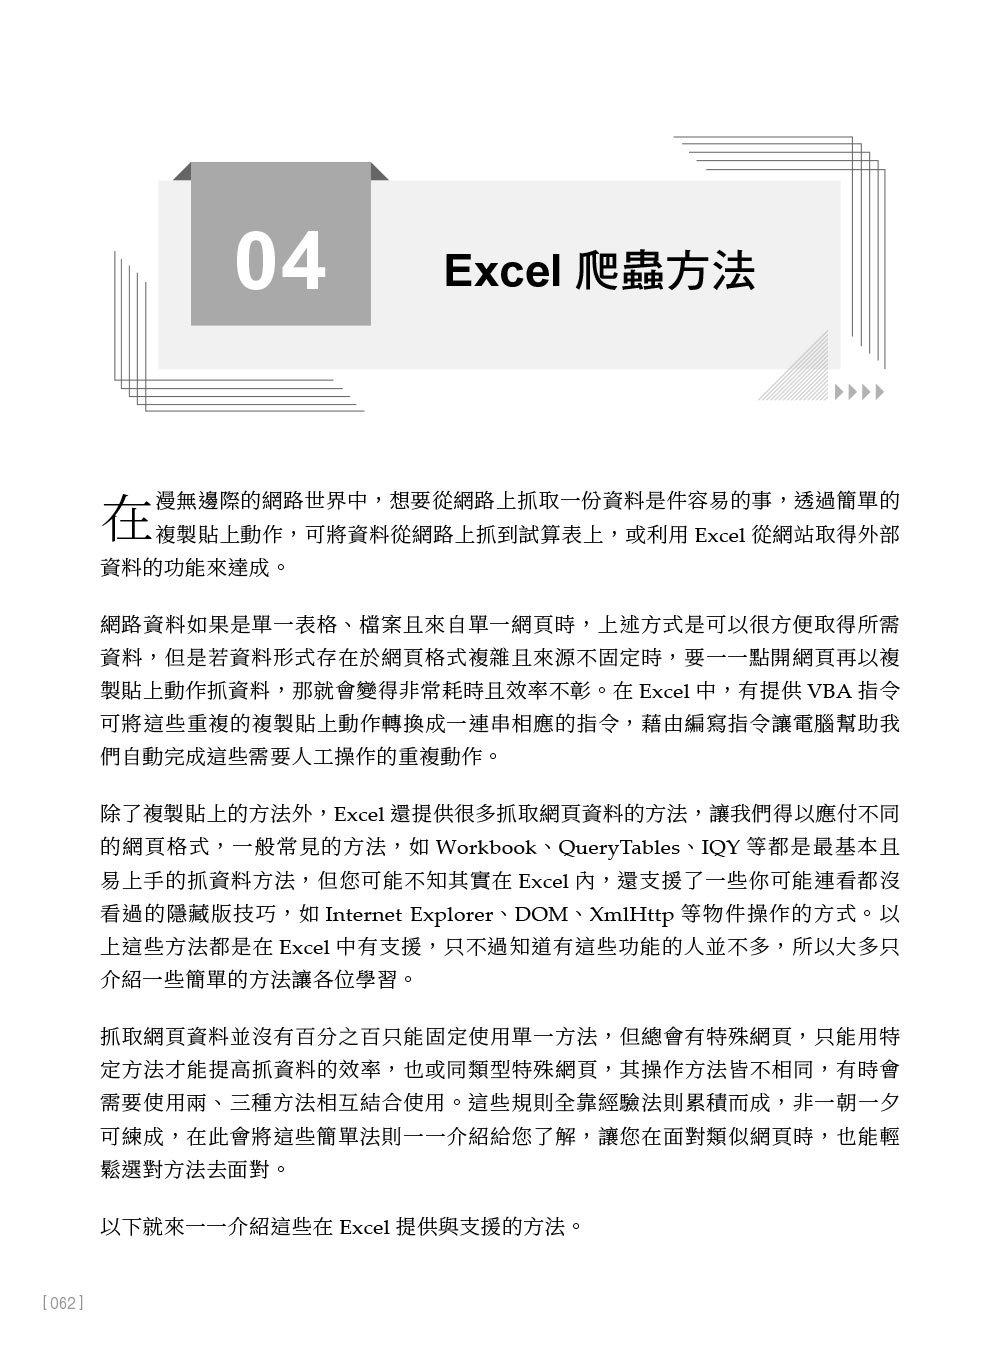 Excel VBA 實戰技巧|金融數據 x 網路爬蟲-preview-8